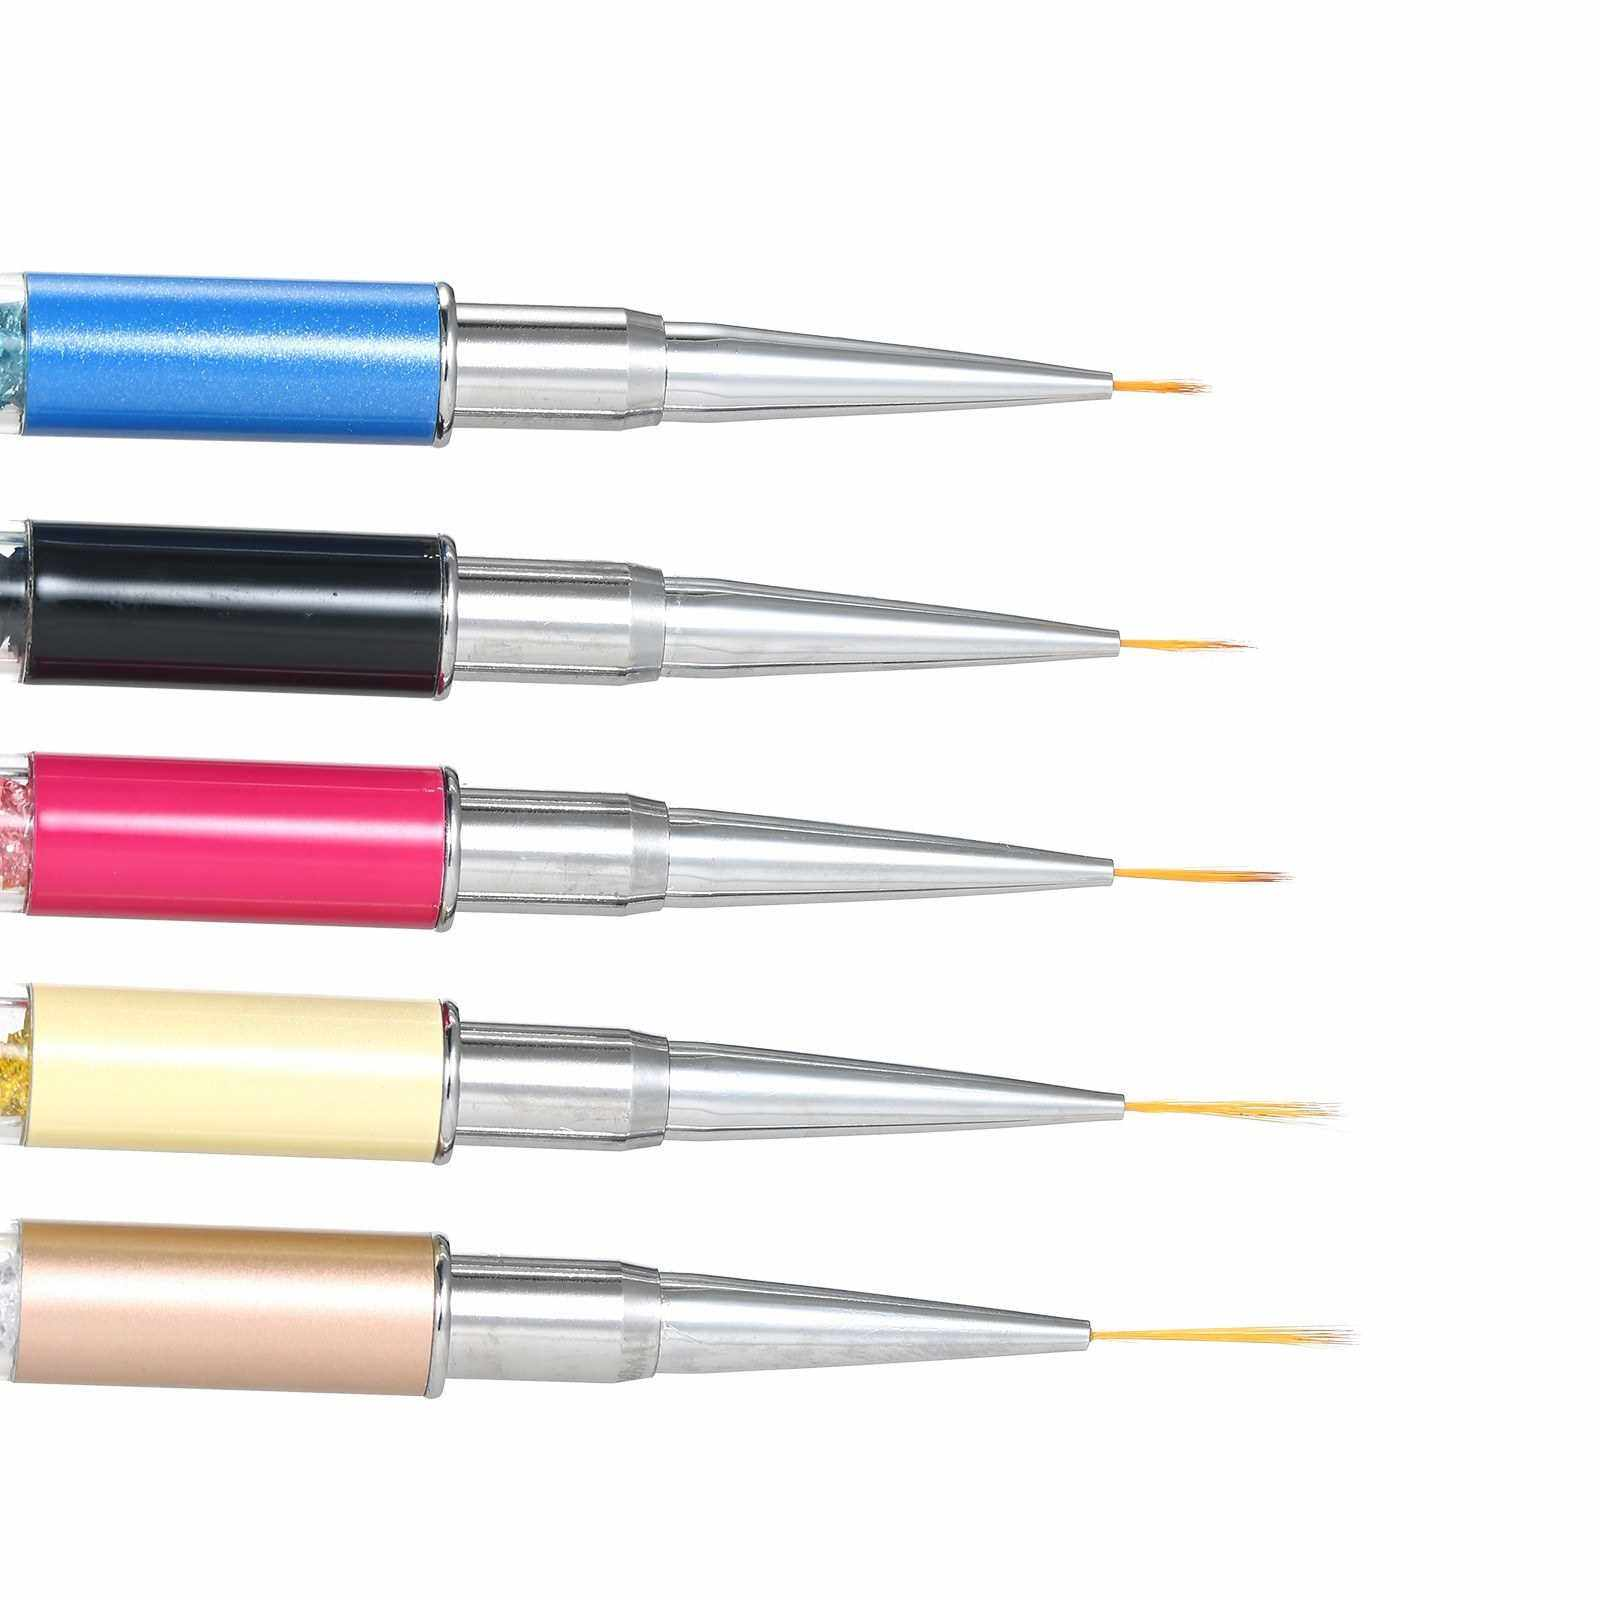 People's Choice 5pcs/set Nail Art Liner Painting Pen Brush DIY Drawing Flower Lines Set DIY UV Gel Tips Design Brushes Shiny Metal Handle Manicure Tools (Standard)